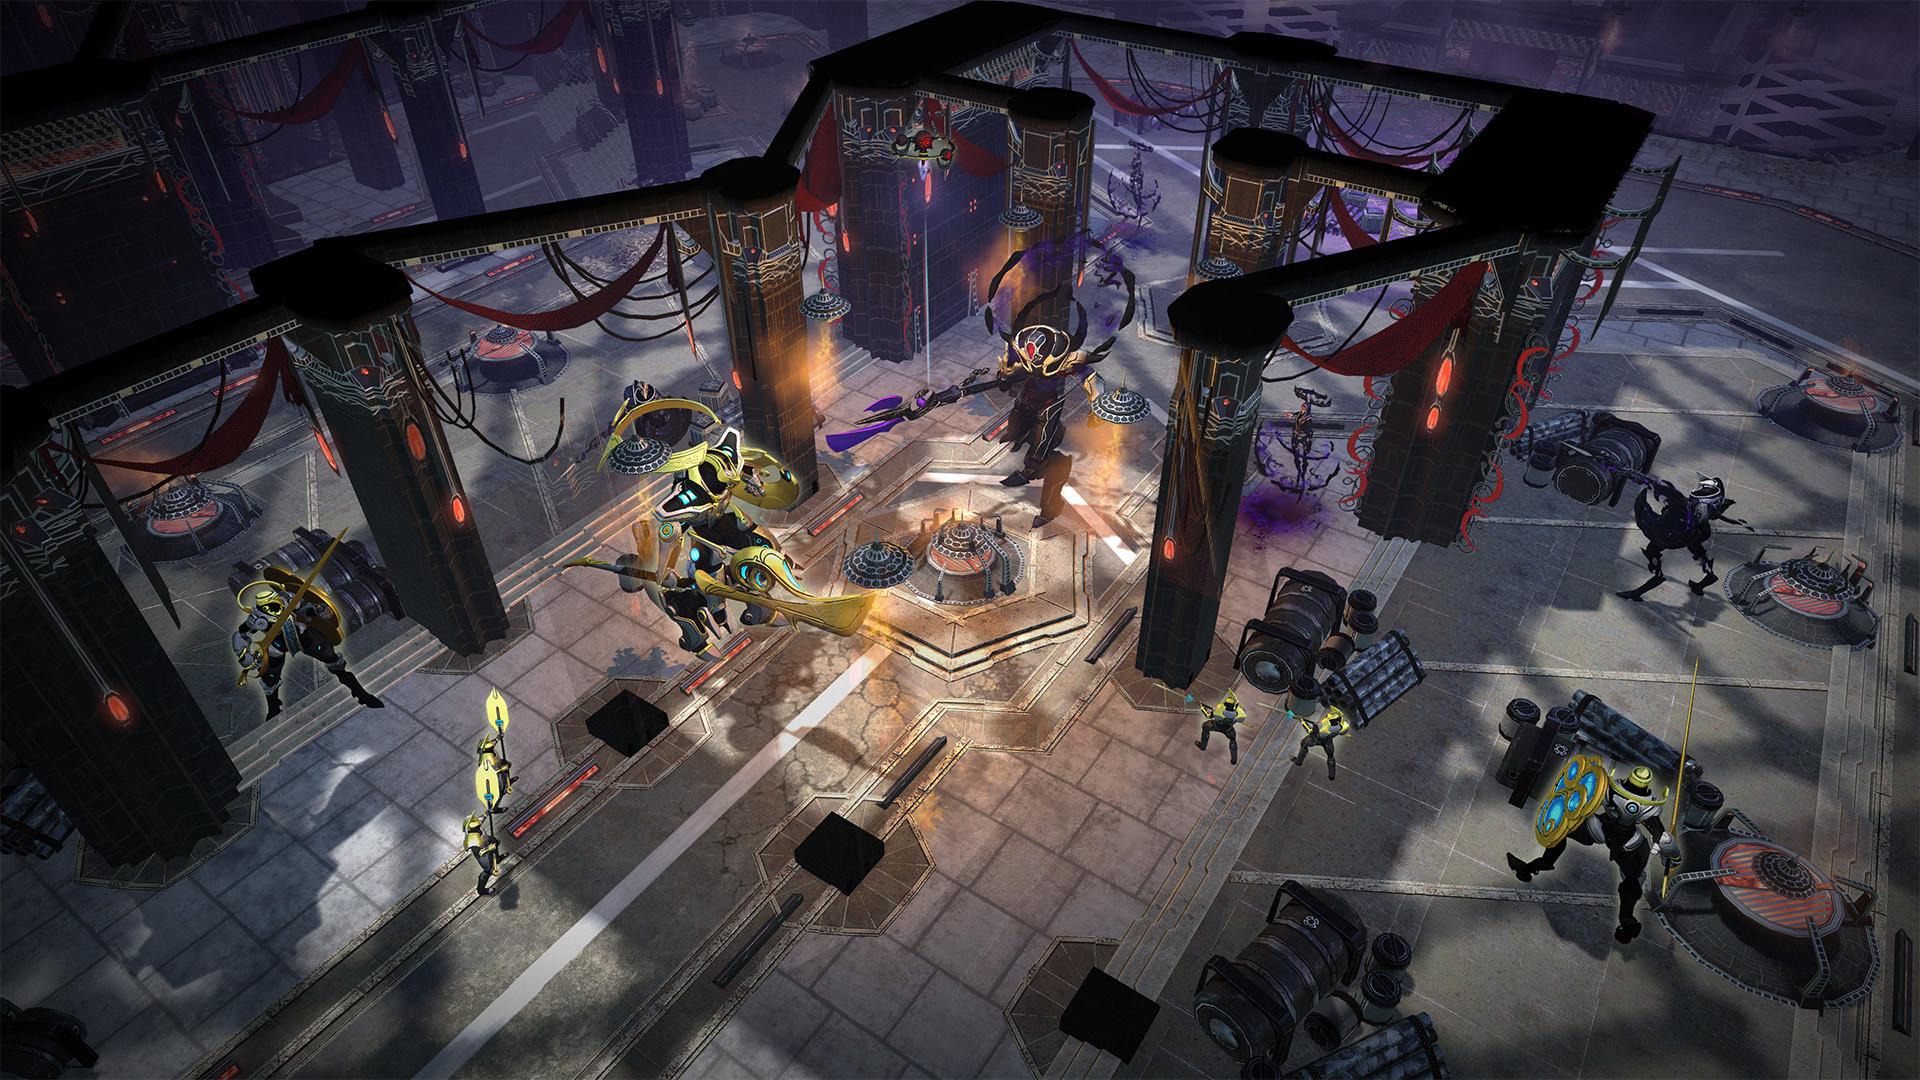 К 4Х-стратегии Age of Wonders: Planetfall выпустили дополнение Star Kings